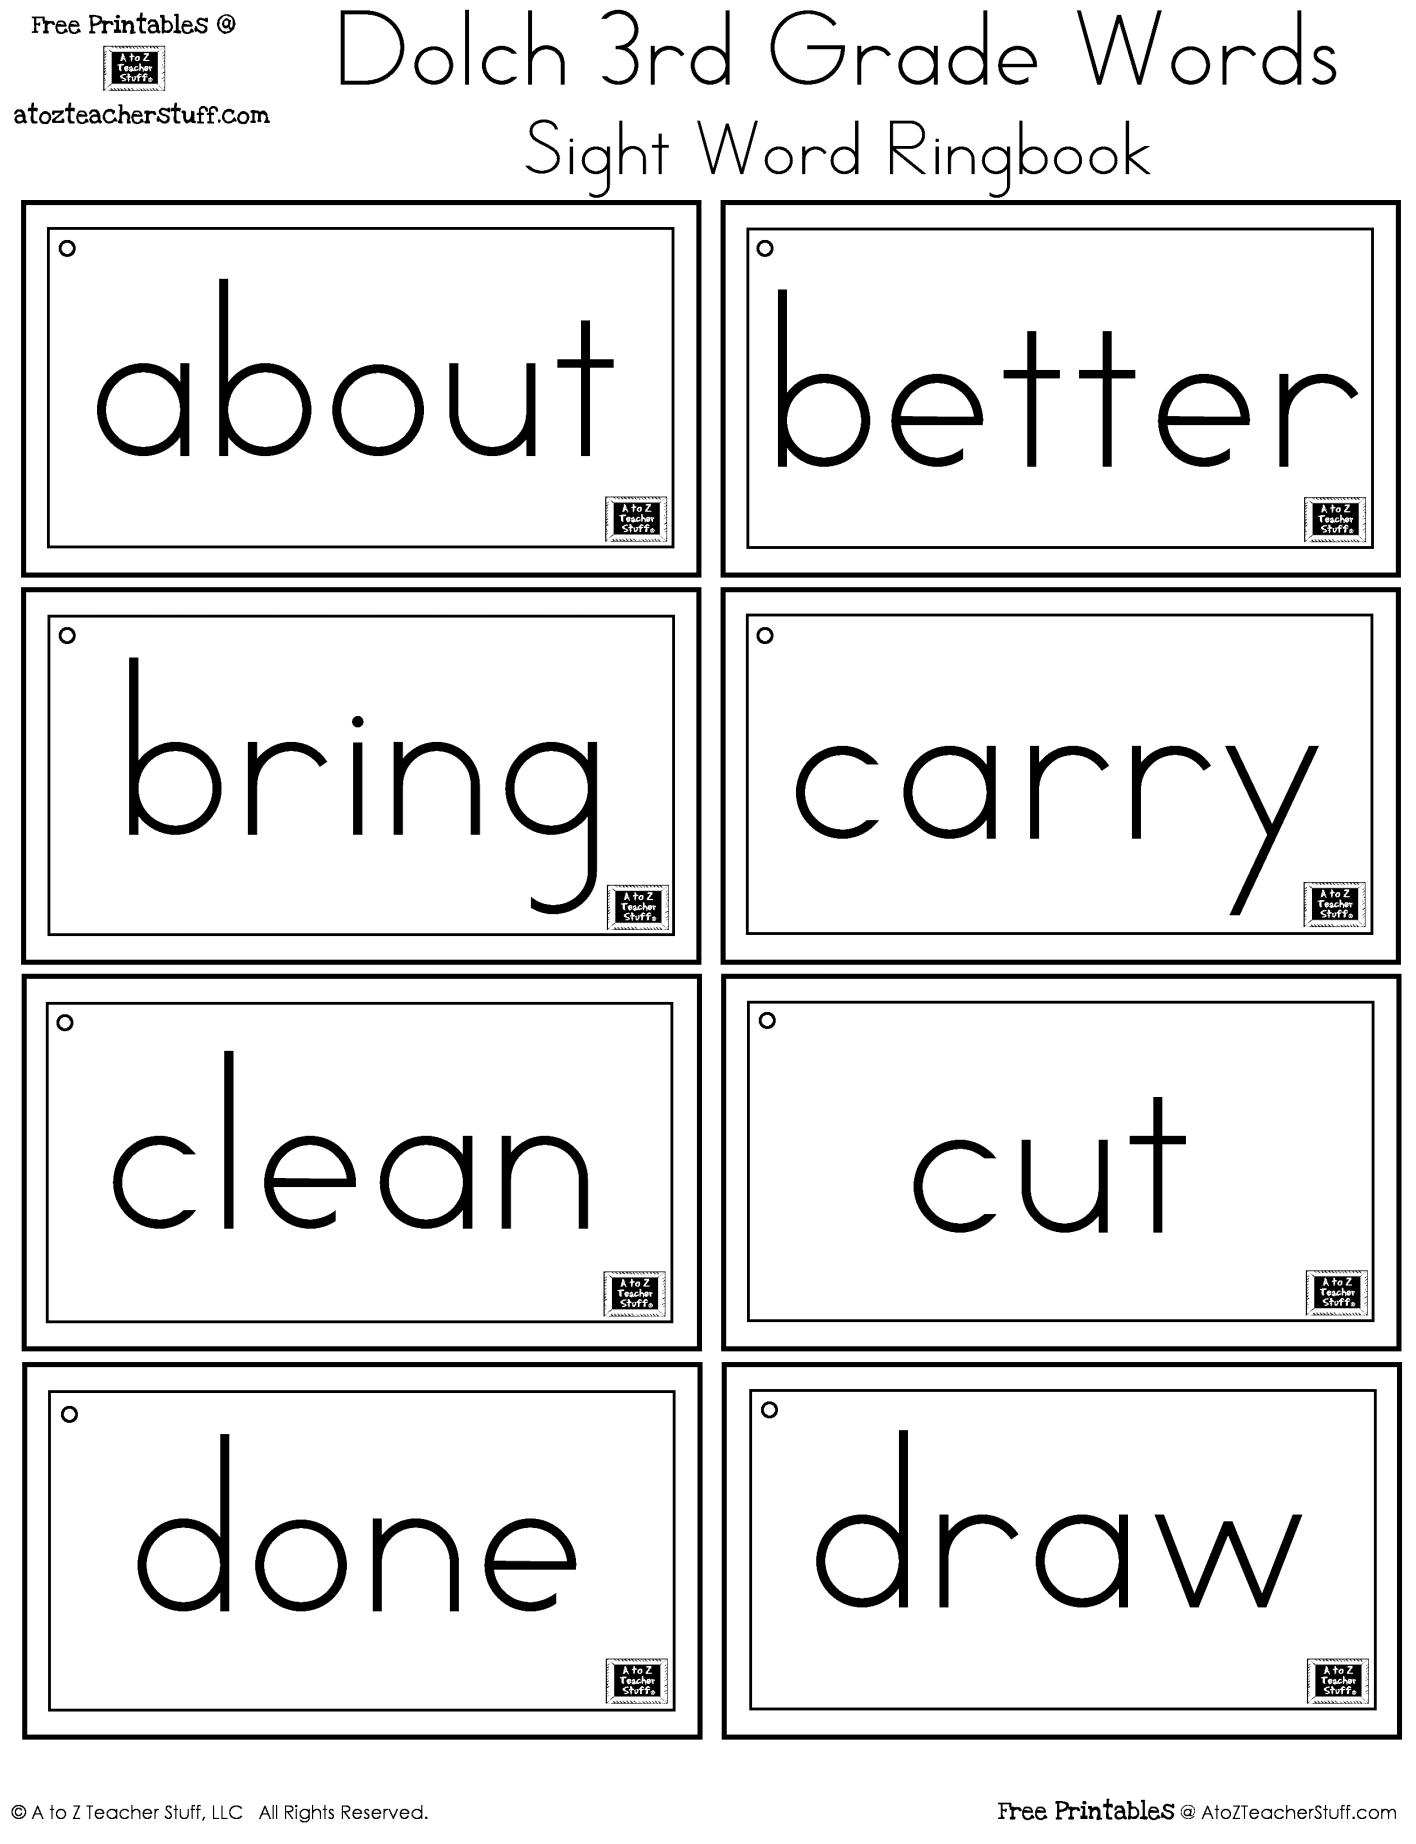 medium resolution of 3rd Grade Dolch Words Sight Word Ringbook   First grade sight words